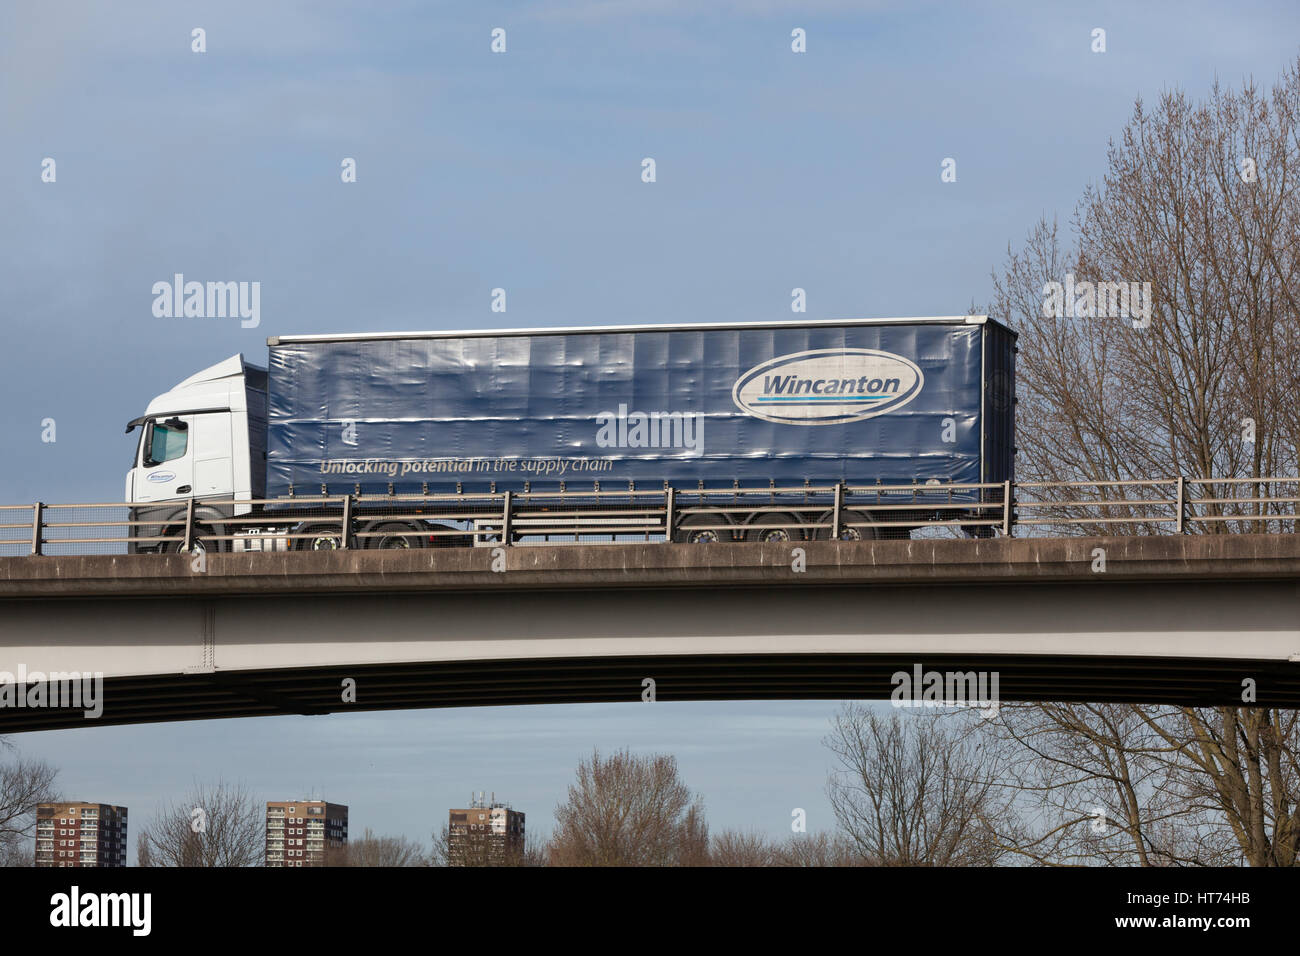 Wincanton Distribution heavy goods vehicle in the Midlands. Stock Photo